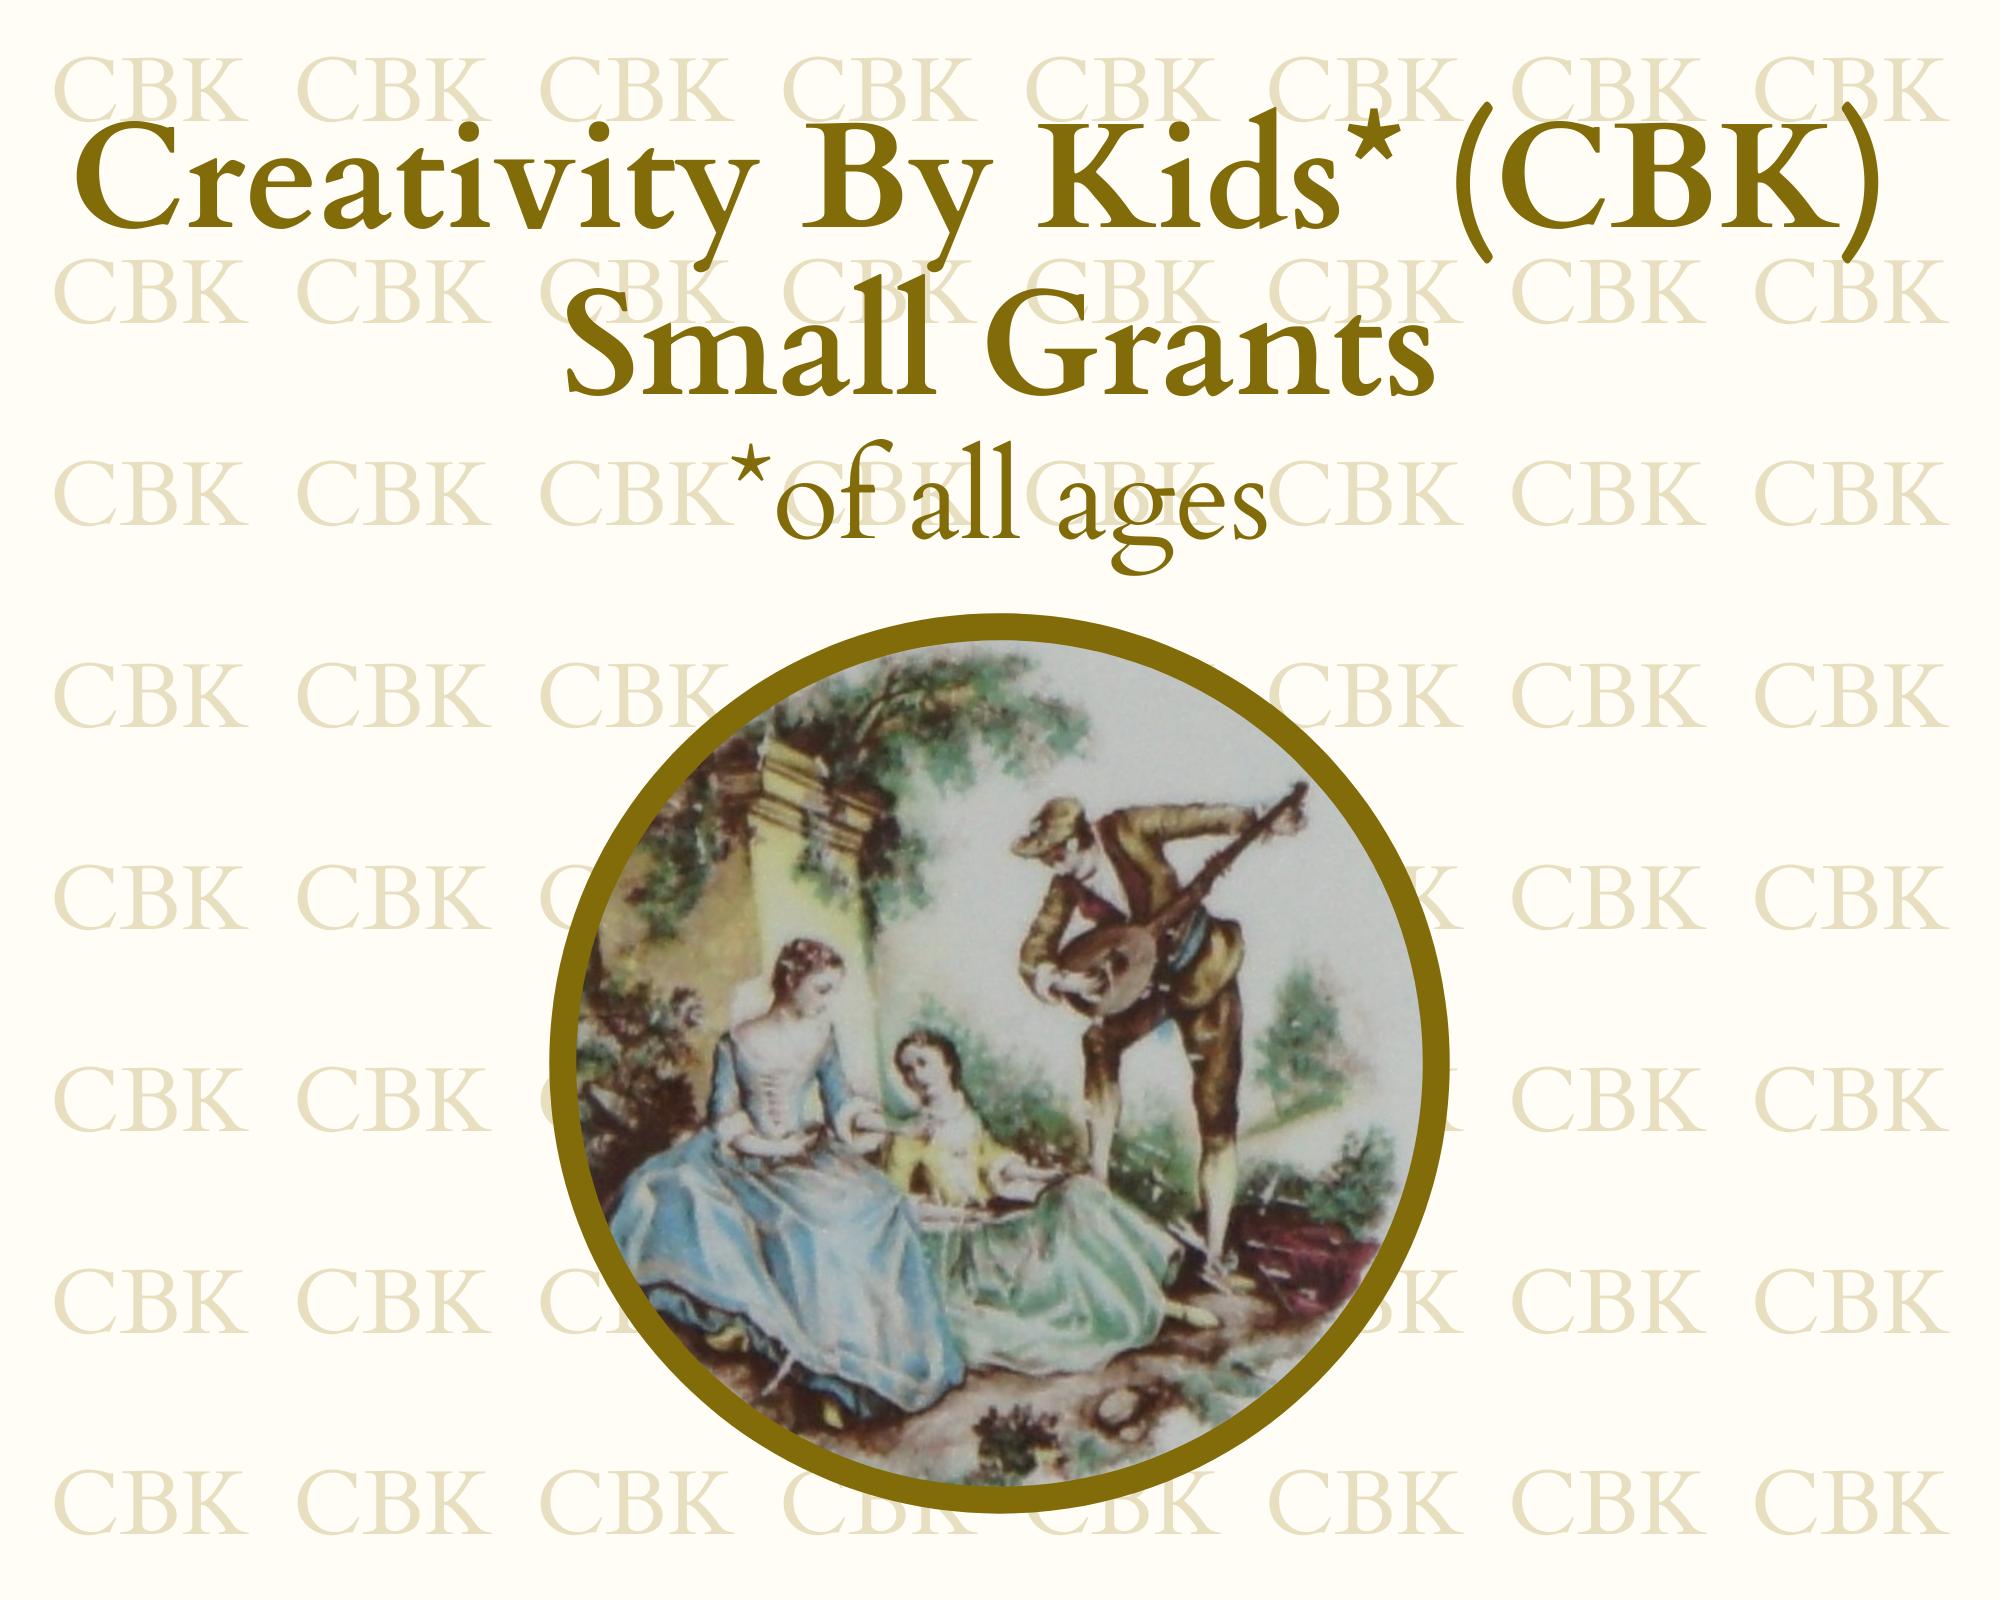 Creativity by Kids (CBK) Grant Awards logo